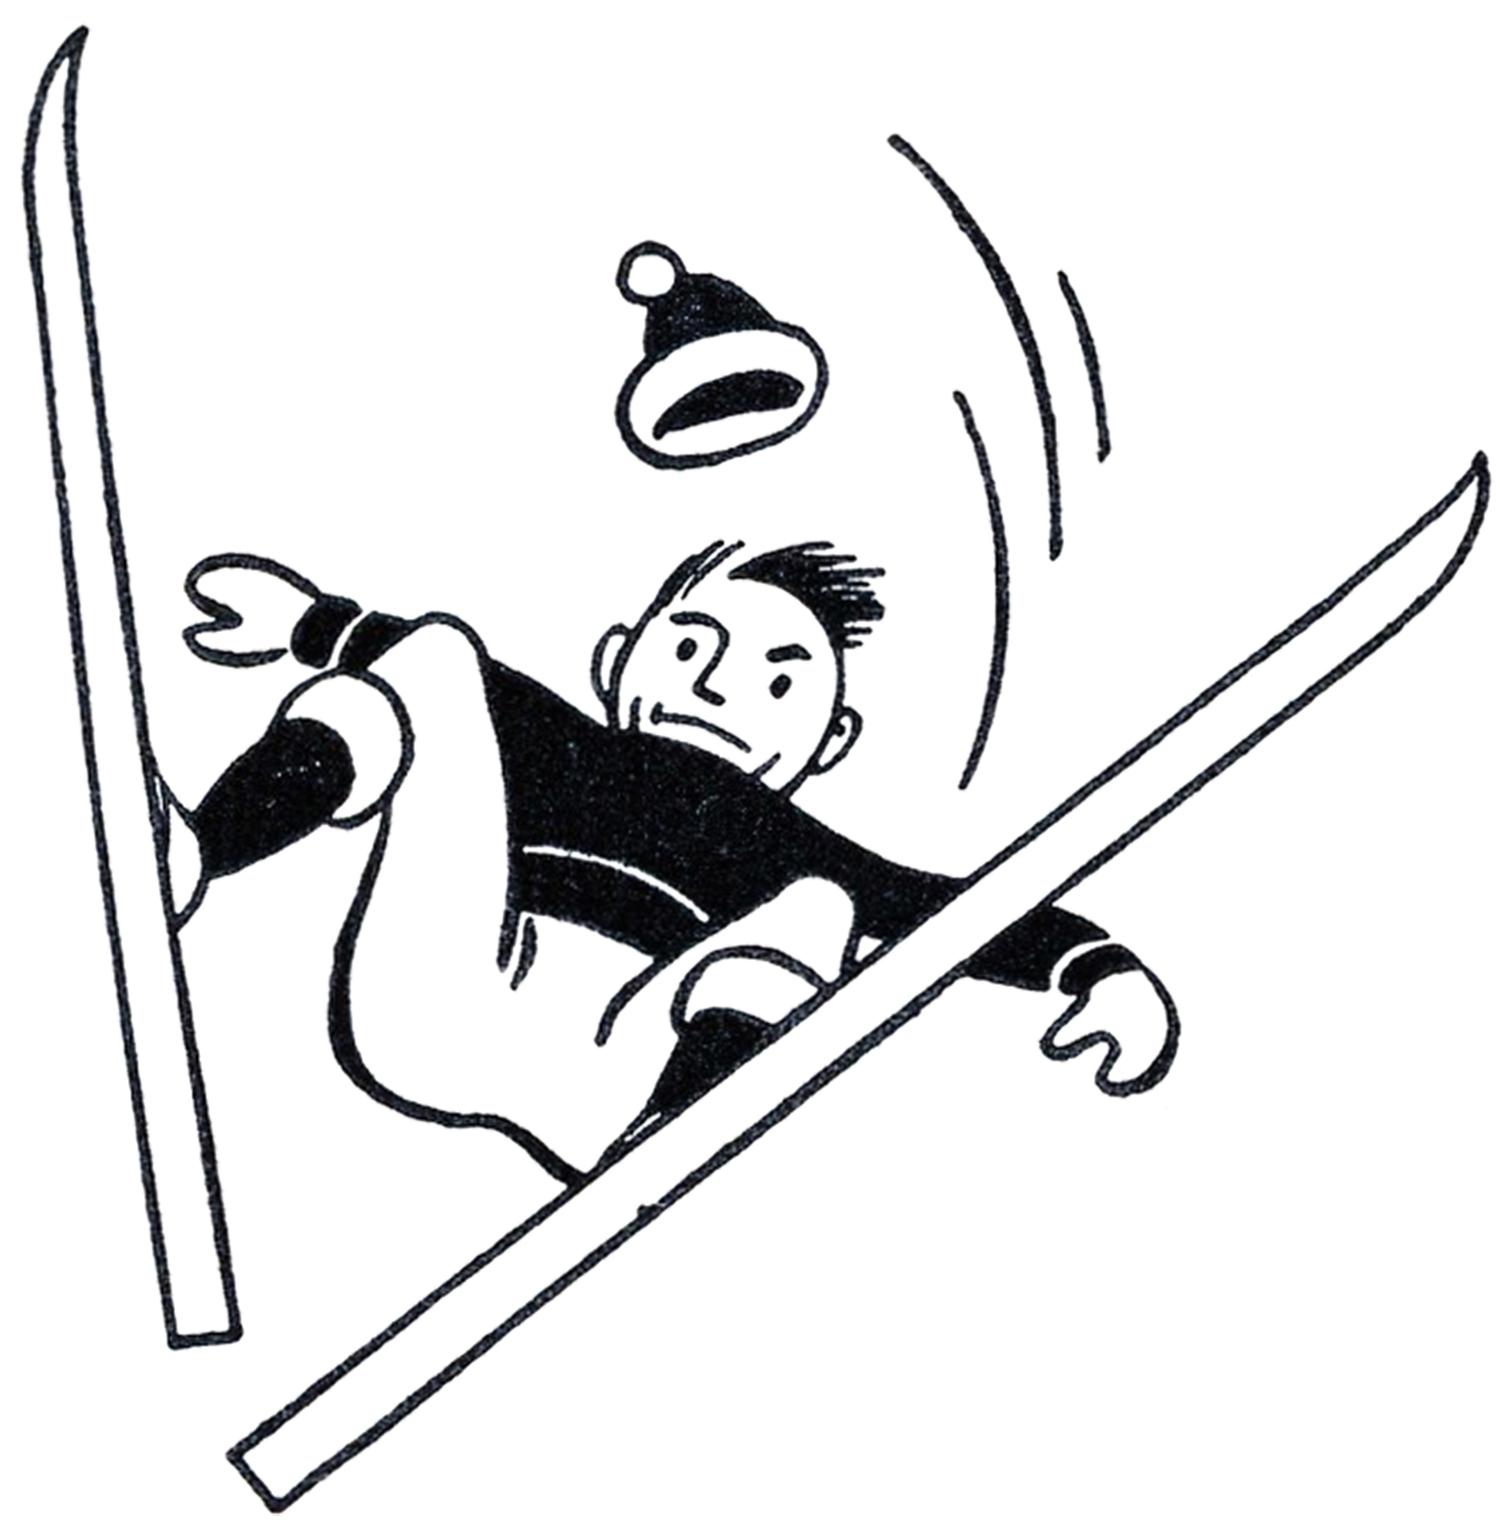 Retro Skiing Clipart-Retro Skiing Clipart-5